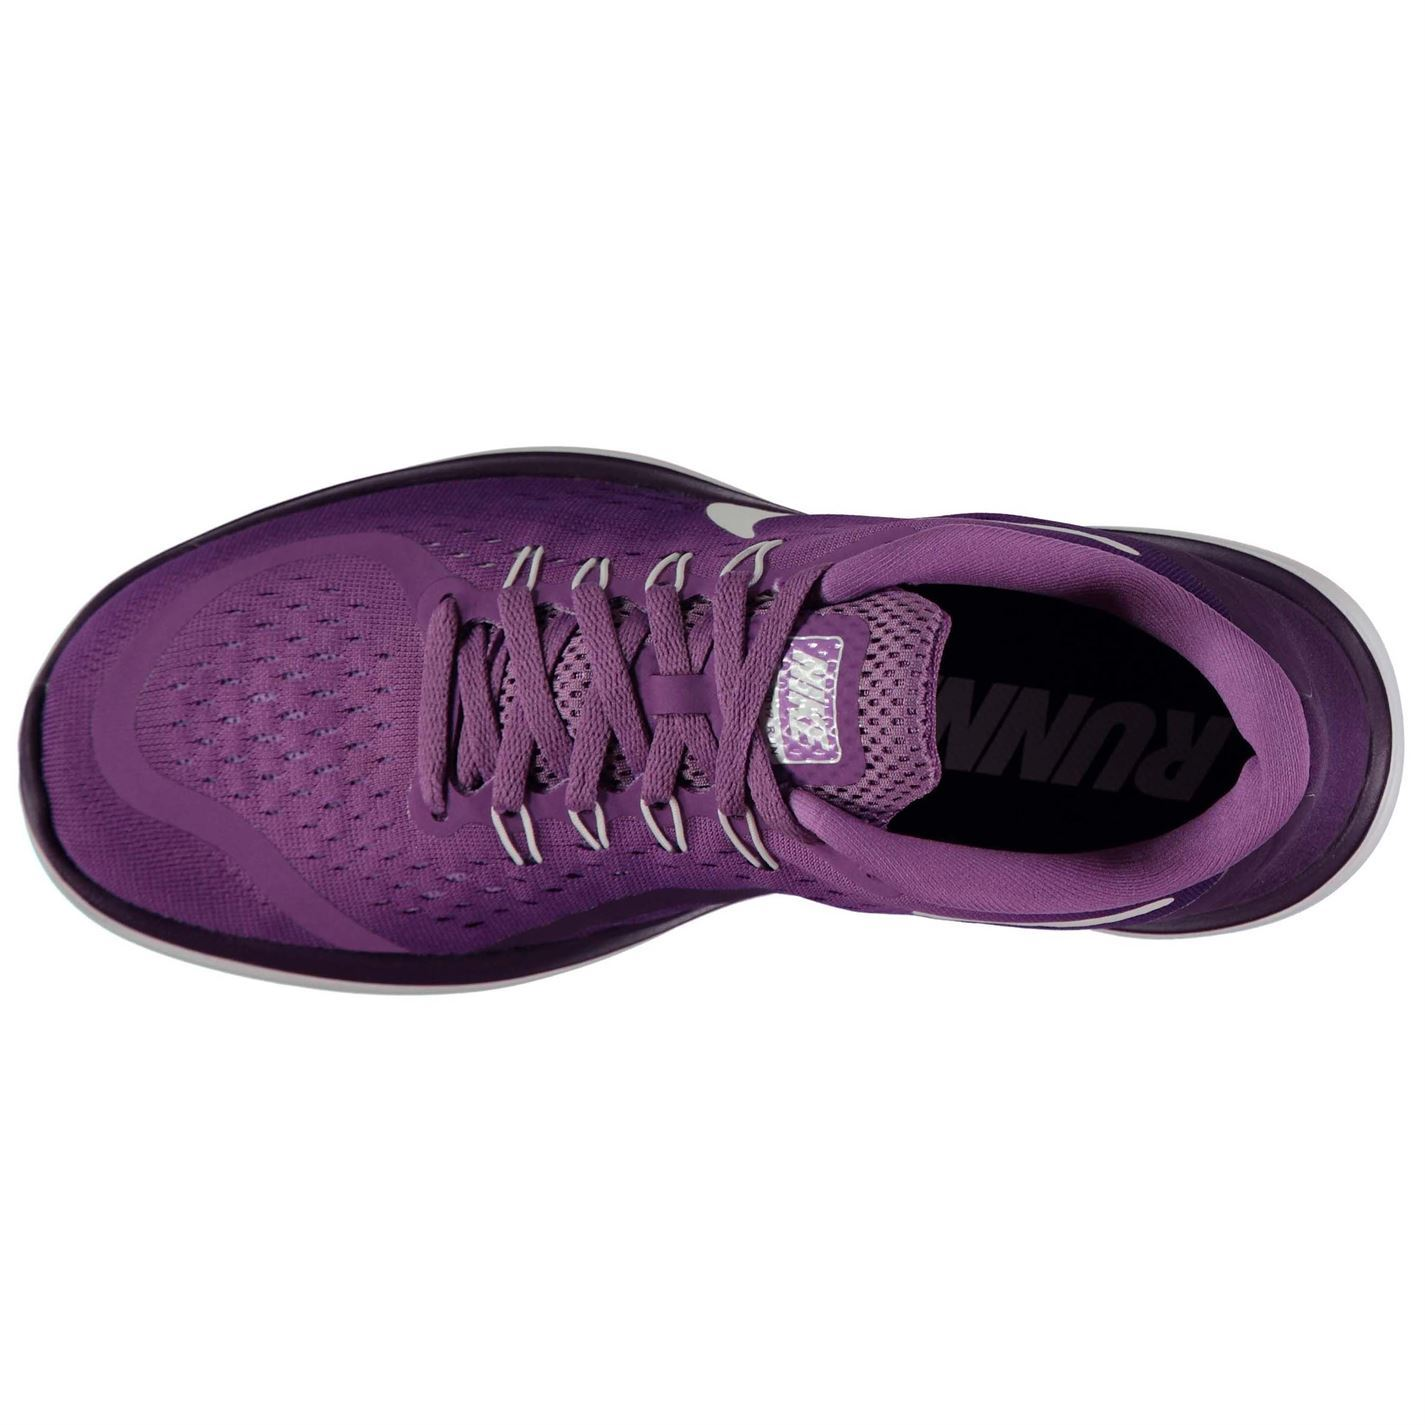 308cedb52894 ... Nike Flex 2017 Running Shoes Womens Purple White Run Jogging Trainers  Sneakers